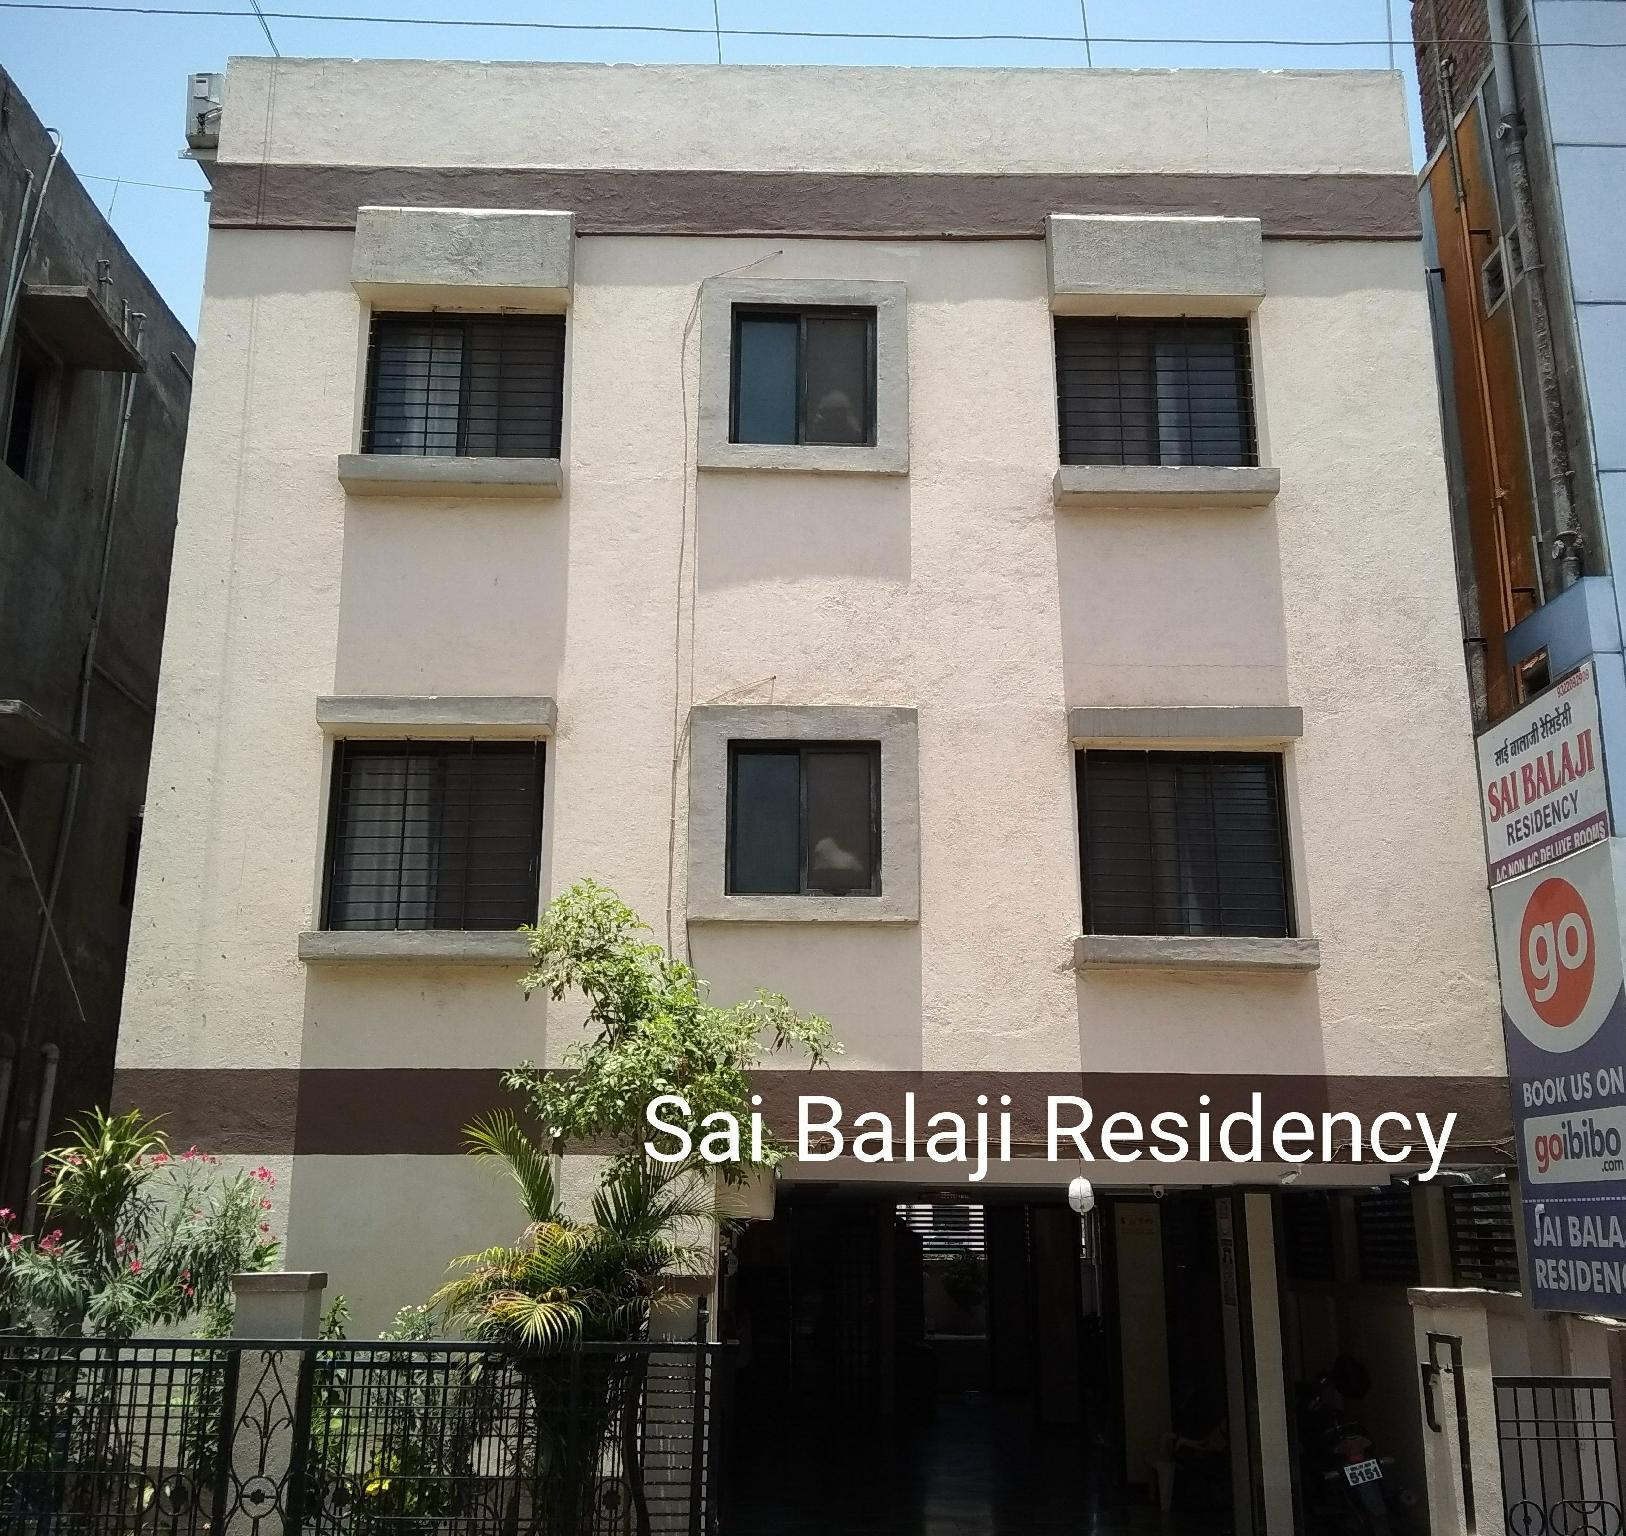 Hotel Sai Balaji Residency